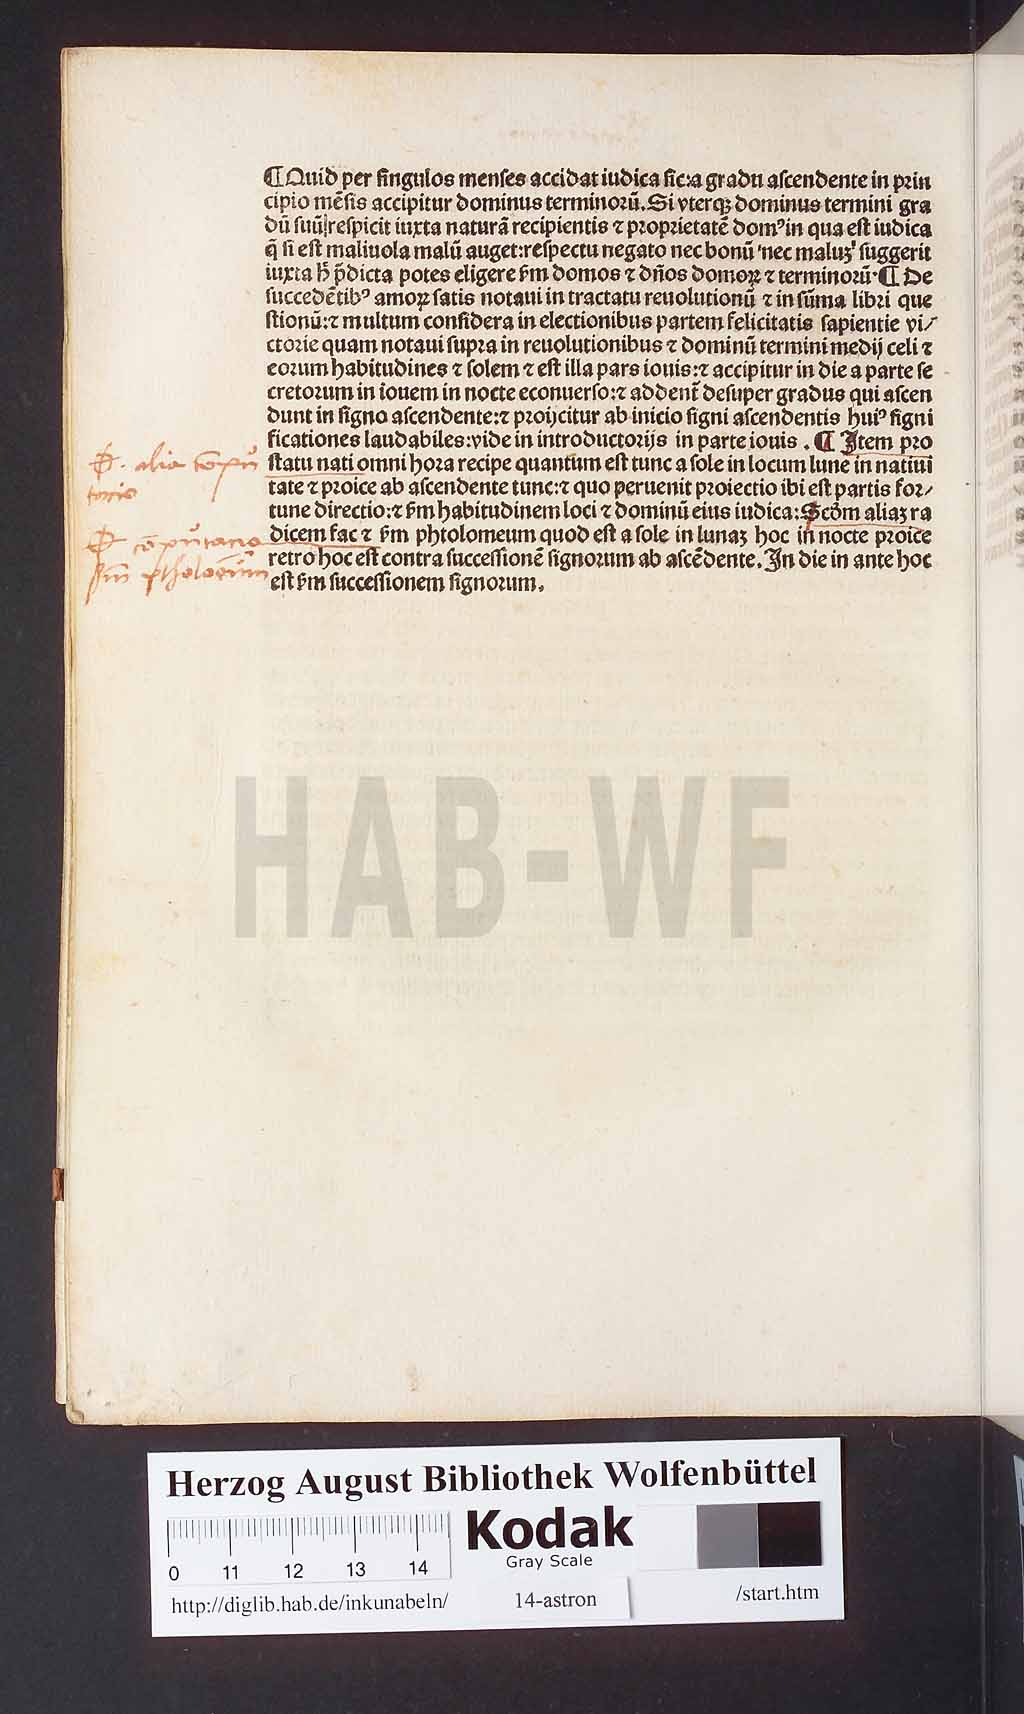 http://diglib.hab.de/inkunabeln/14-astron/00218.jpg